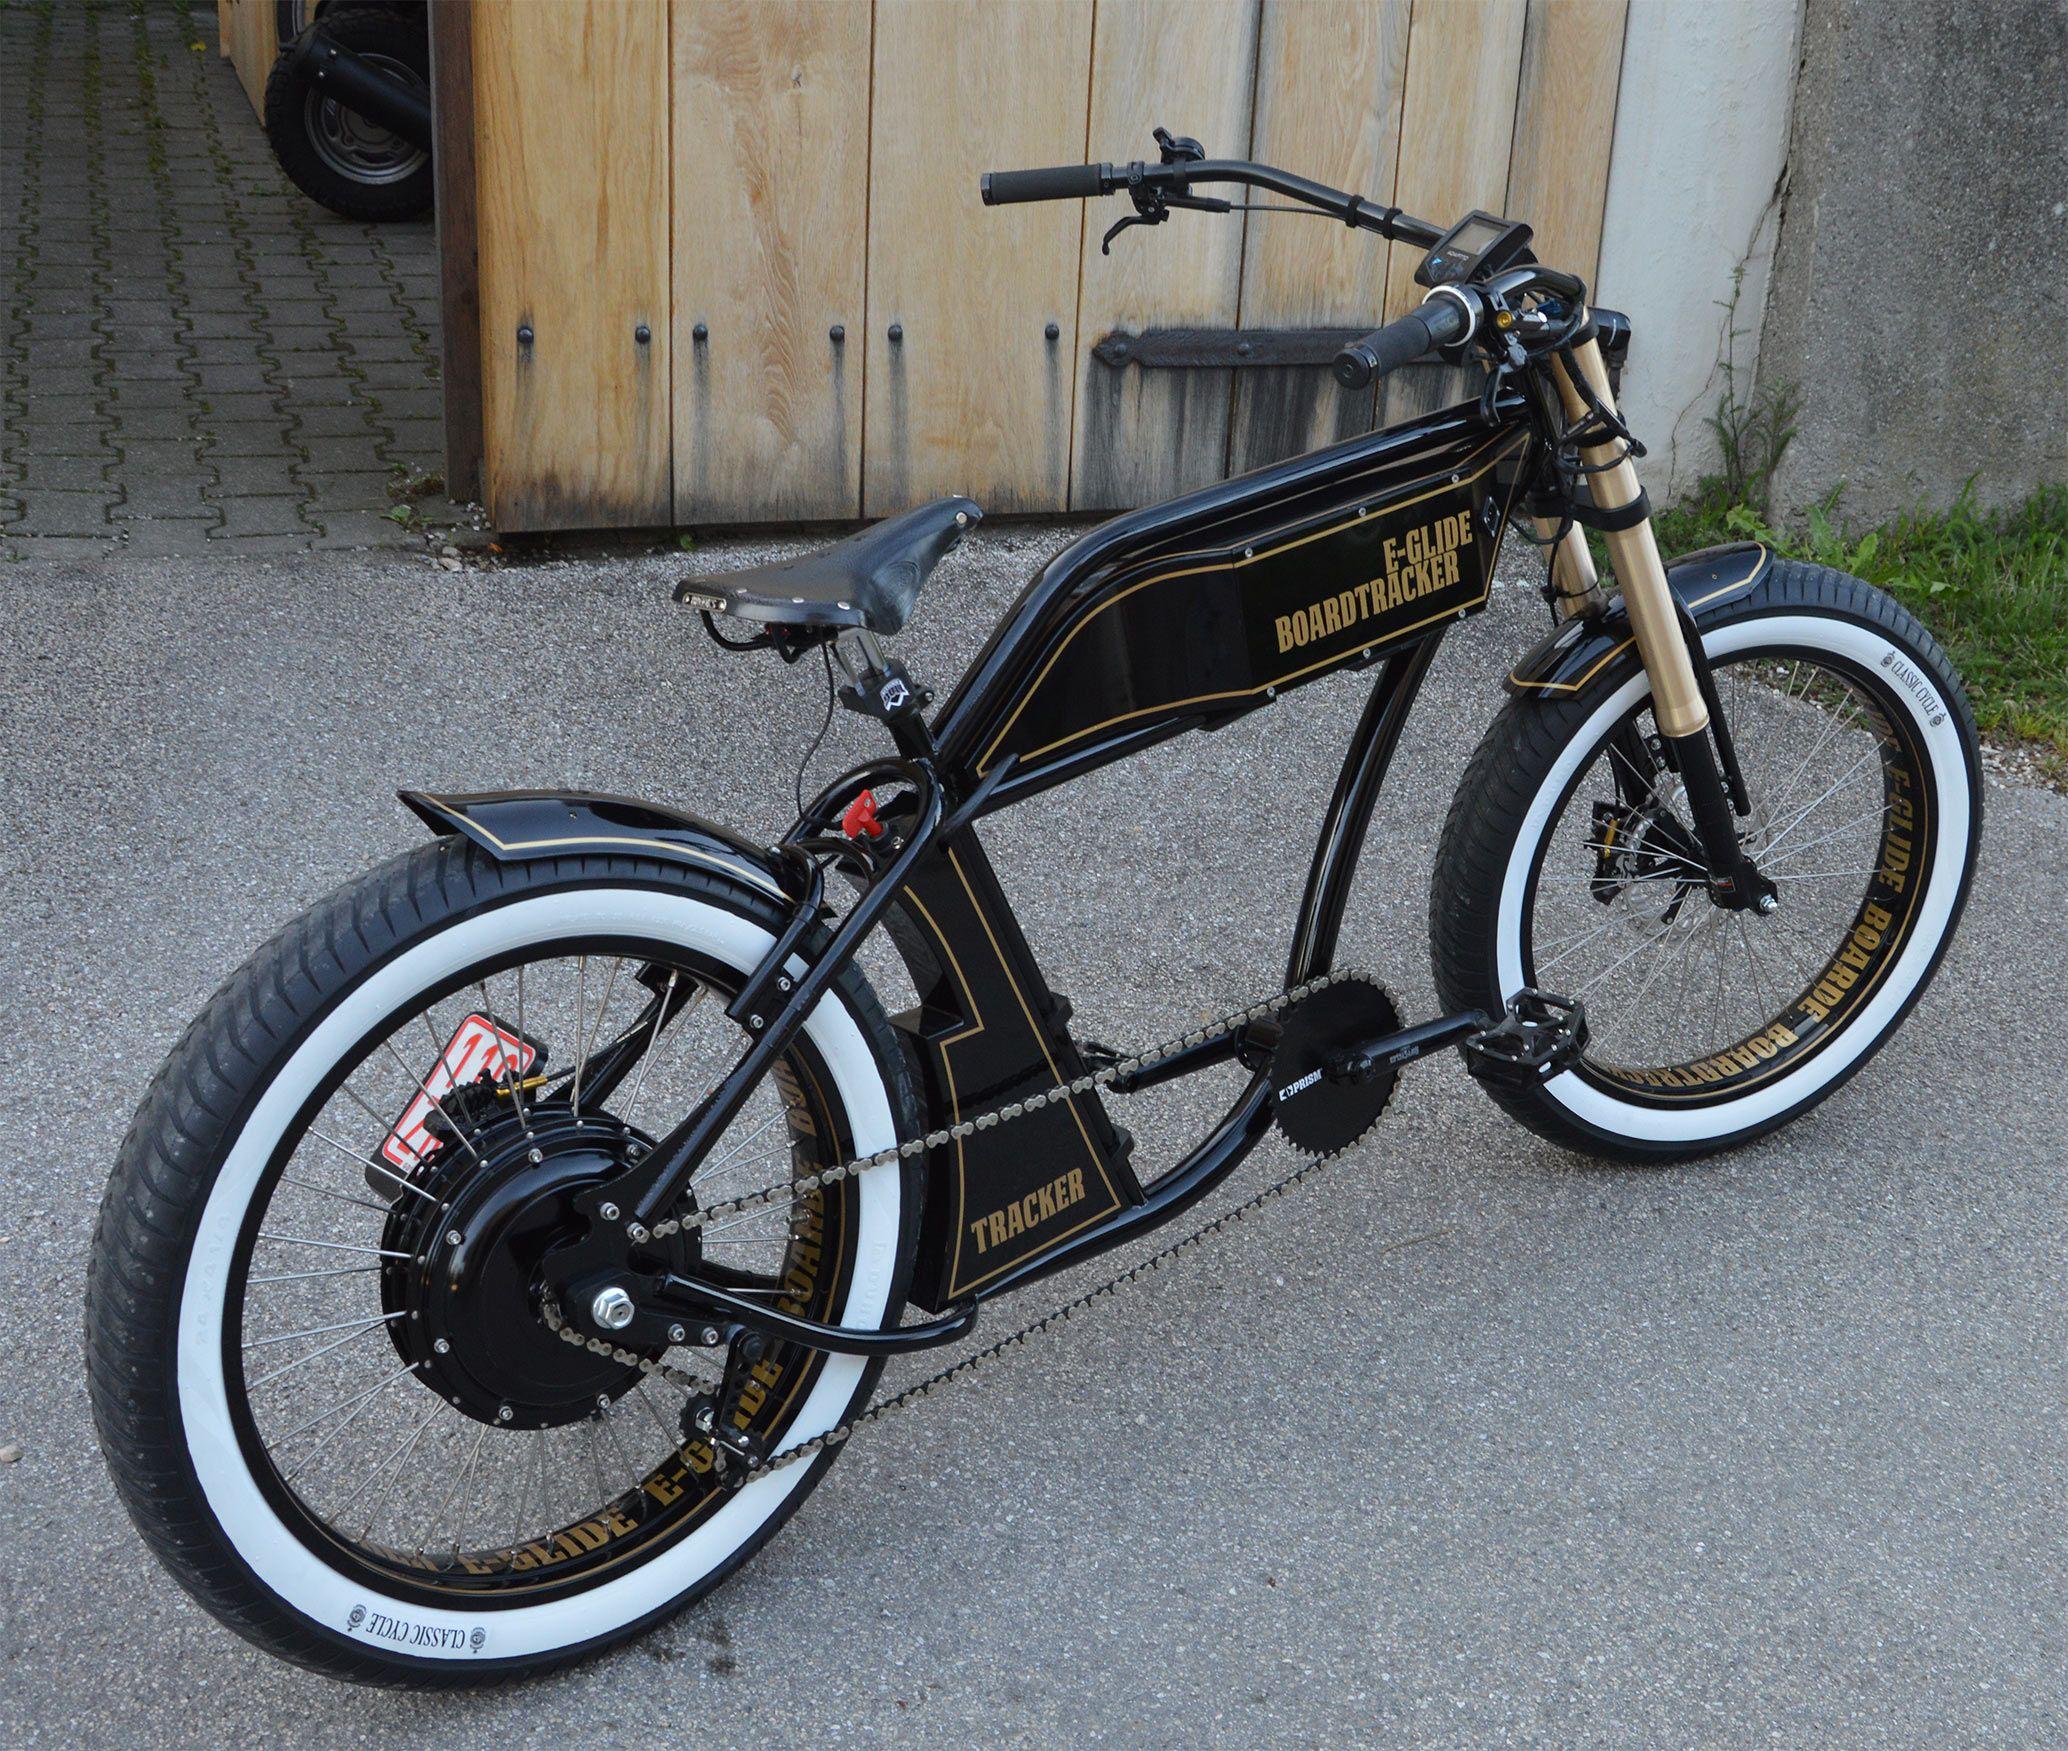 Classic Bicycle Parts Buy Online Cars Diy Chopper Bike